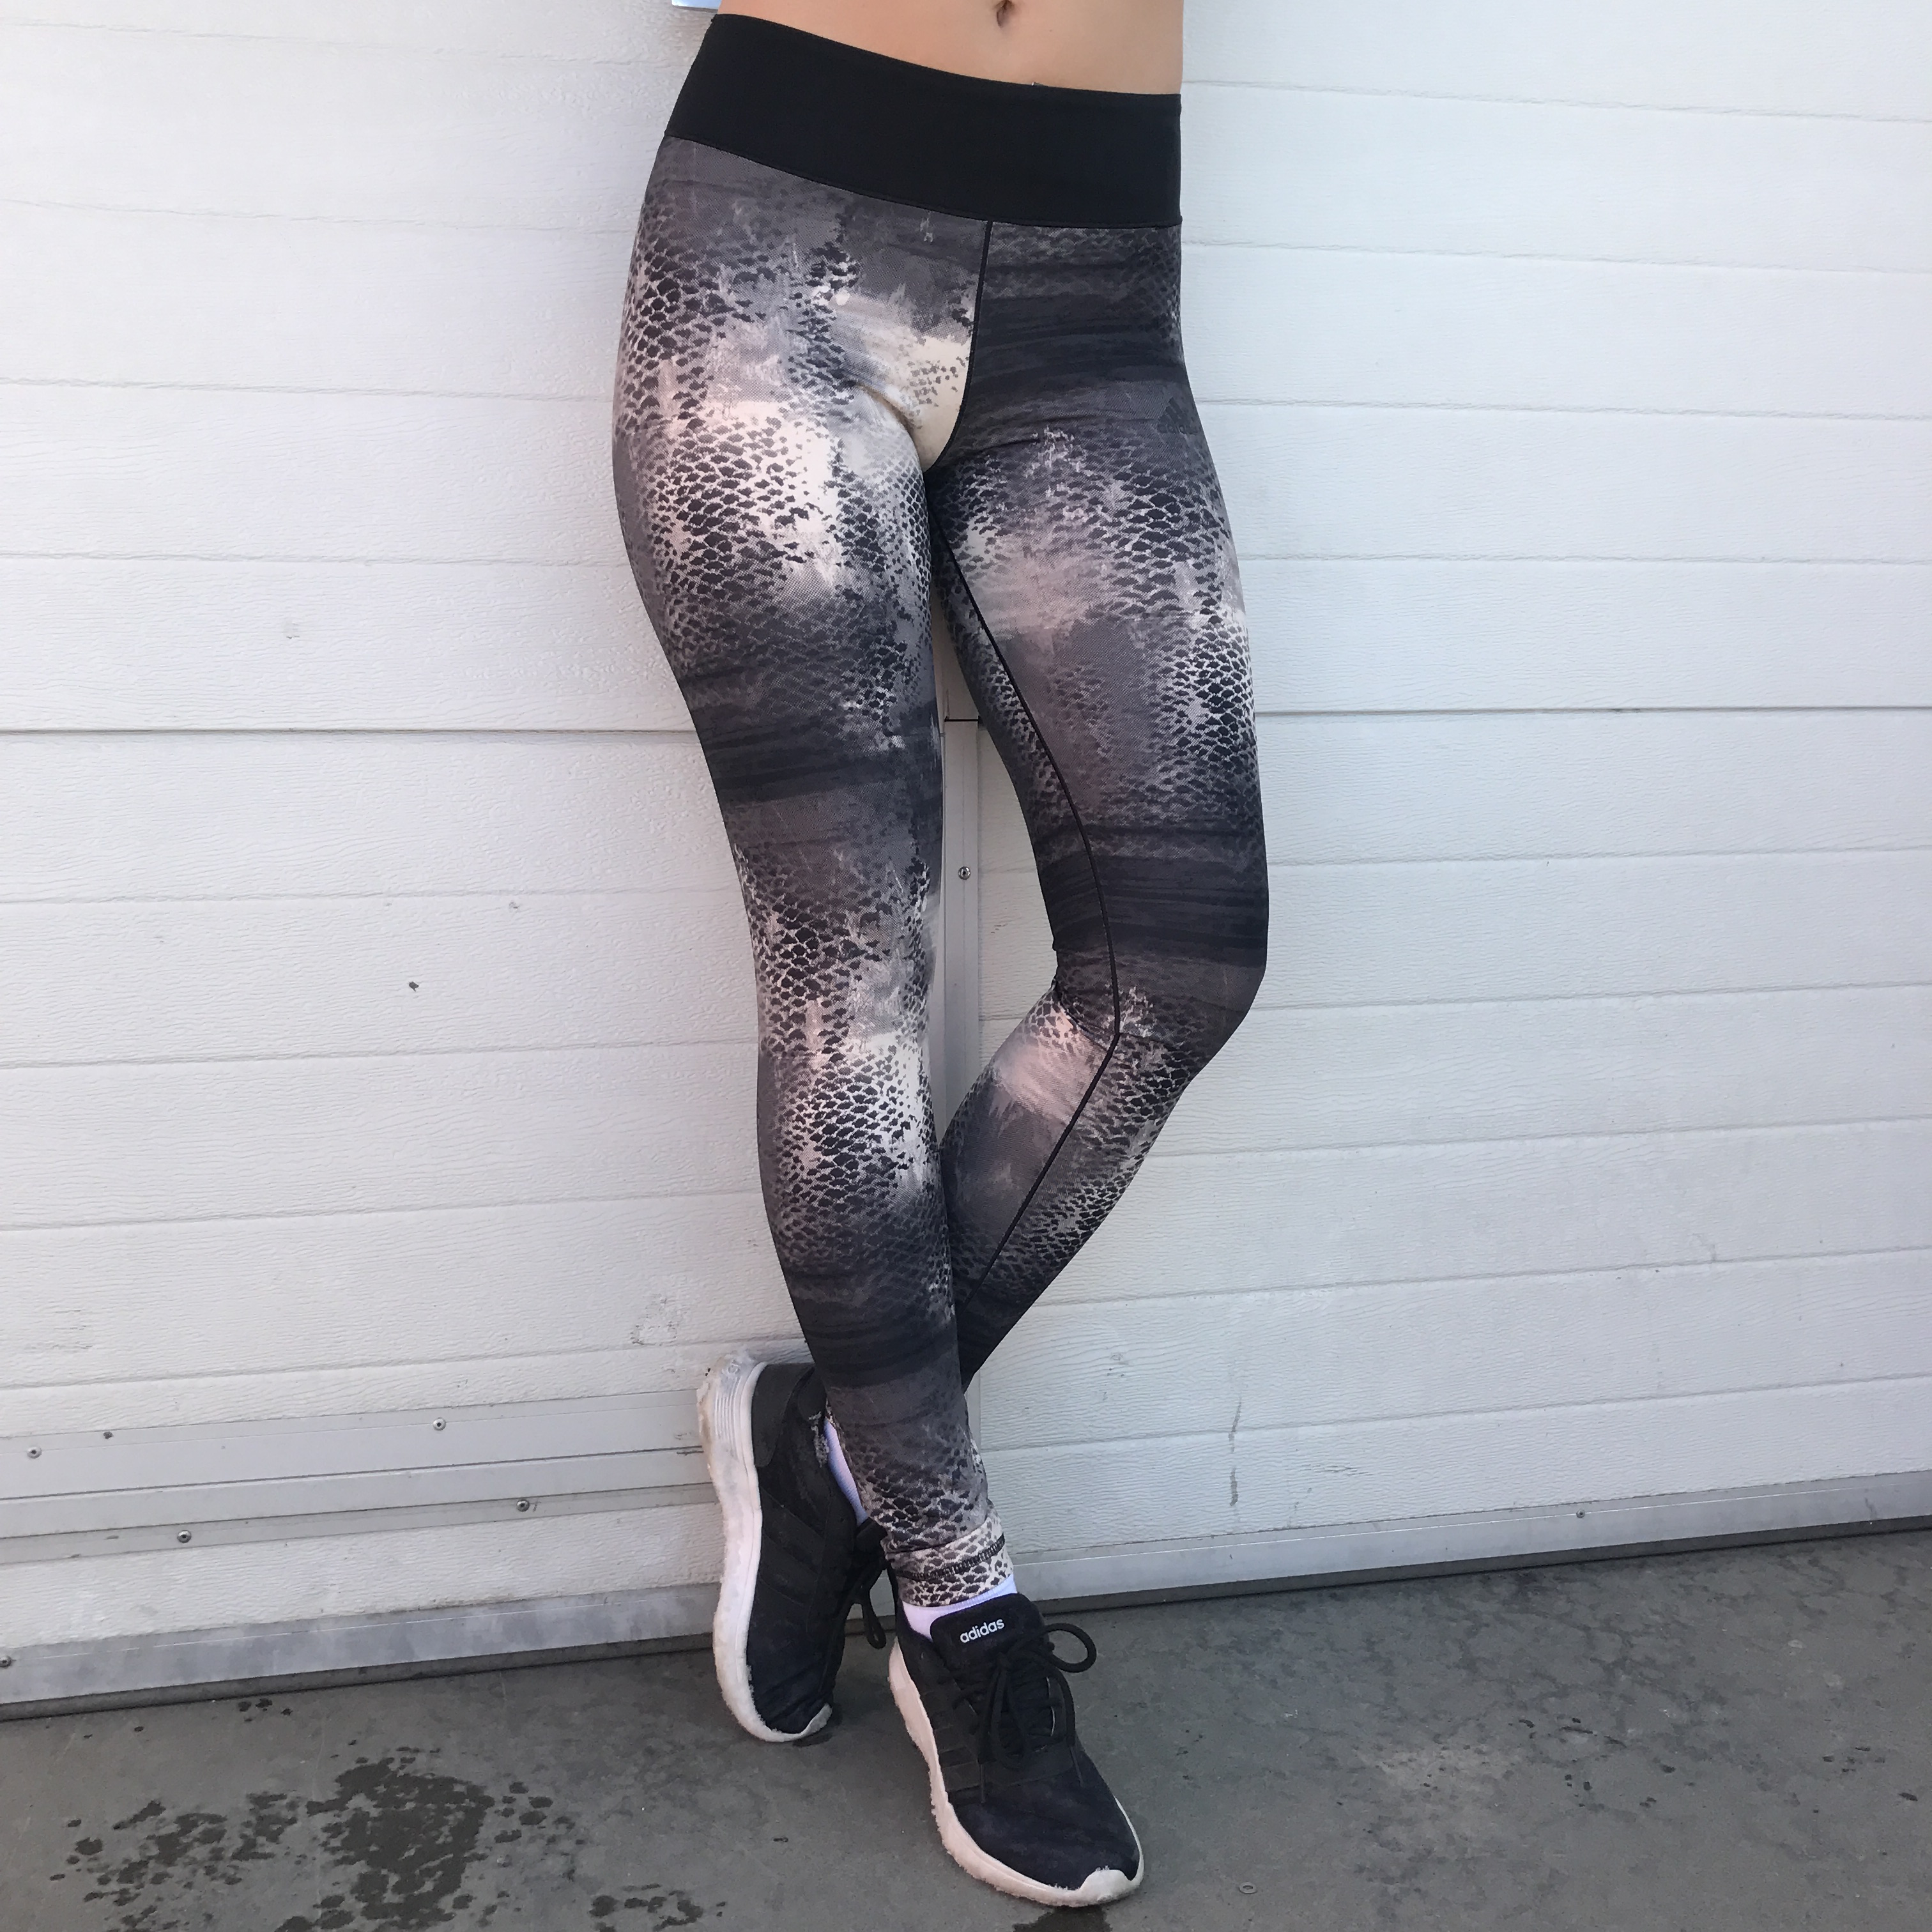 c4600803 adidas, tights, joggesko, treningstøy treningsklær, aktiv, dame ...